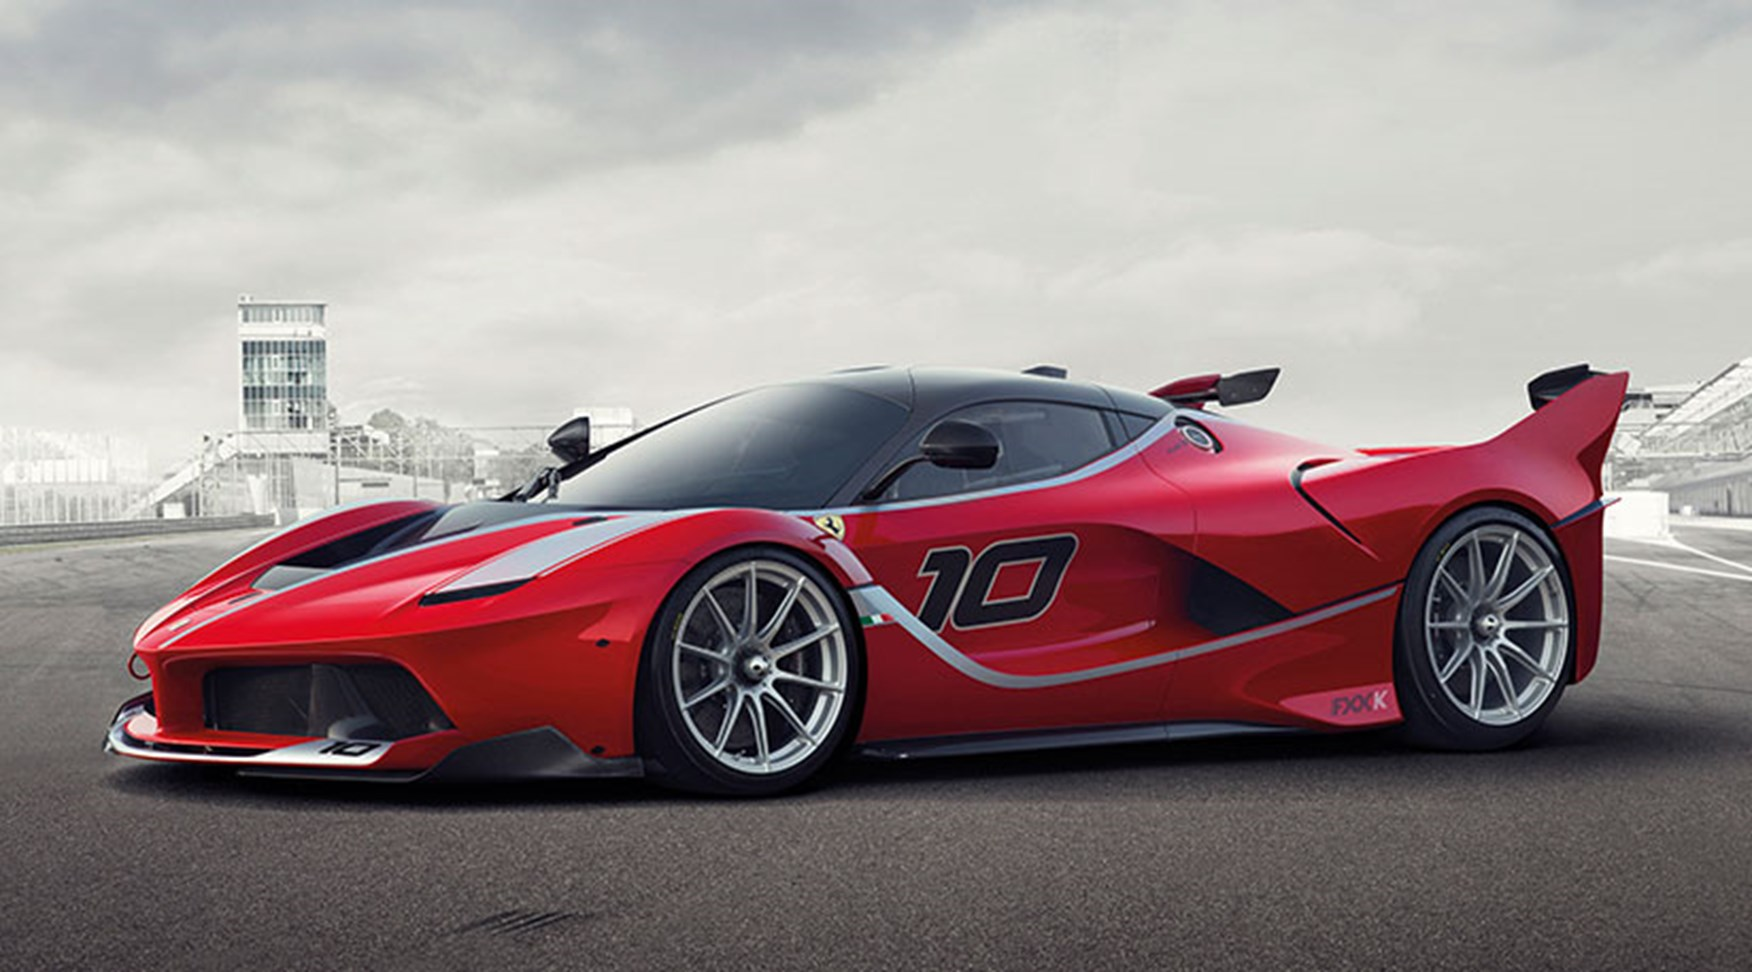 Mclaren P1 Gtr Logo >> LaFerrari FXX K revealed (2015) - the ultimate track car? by CAR Magazine